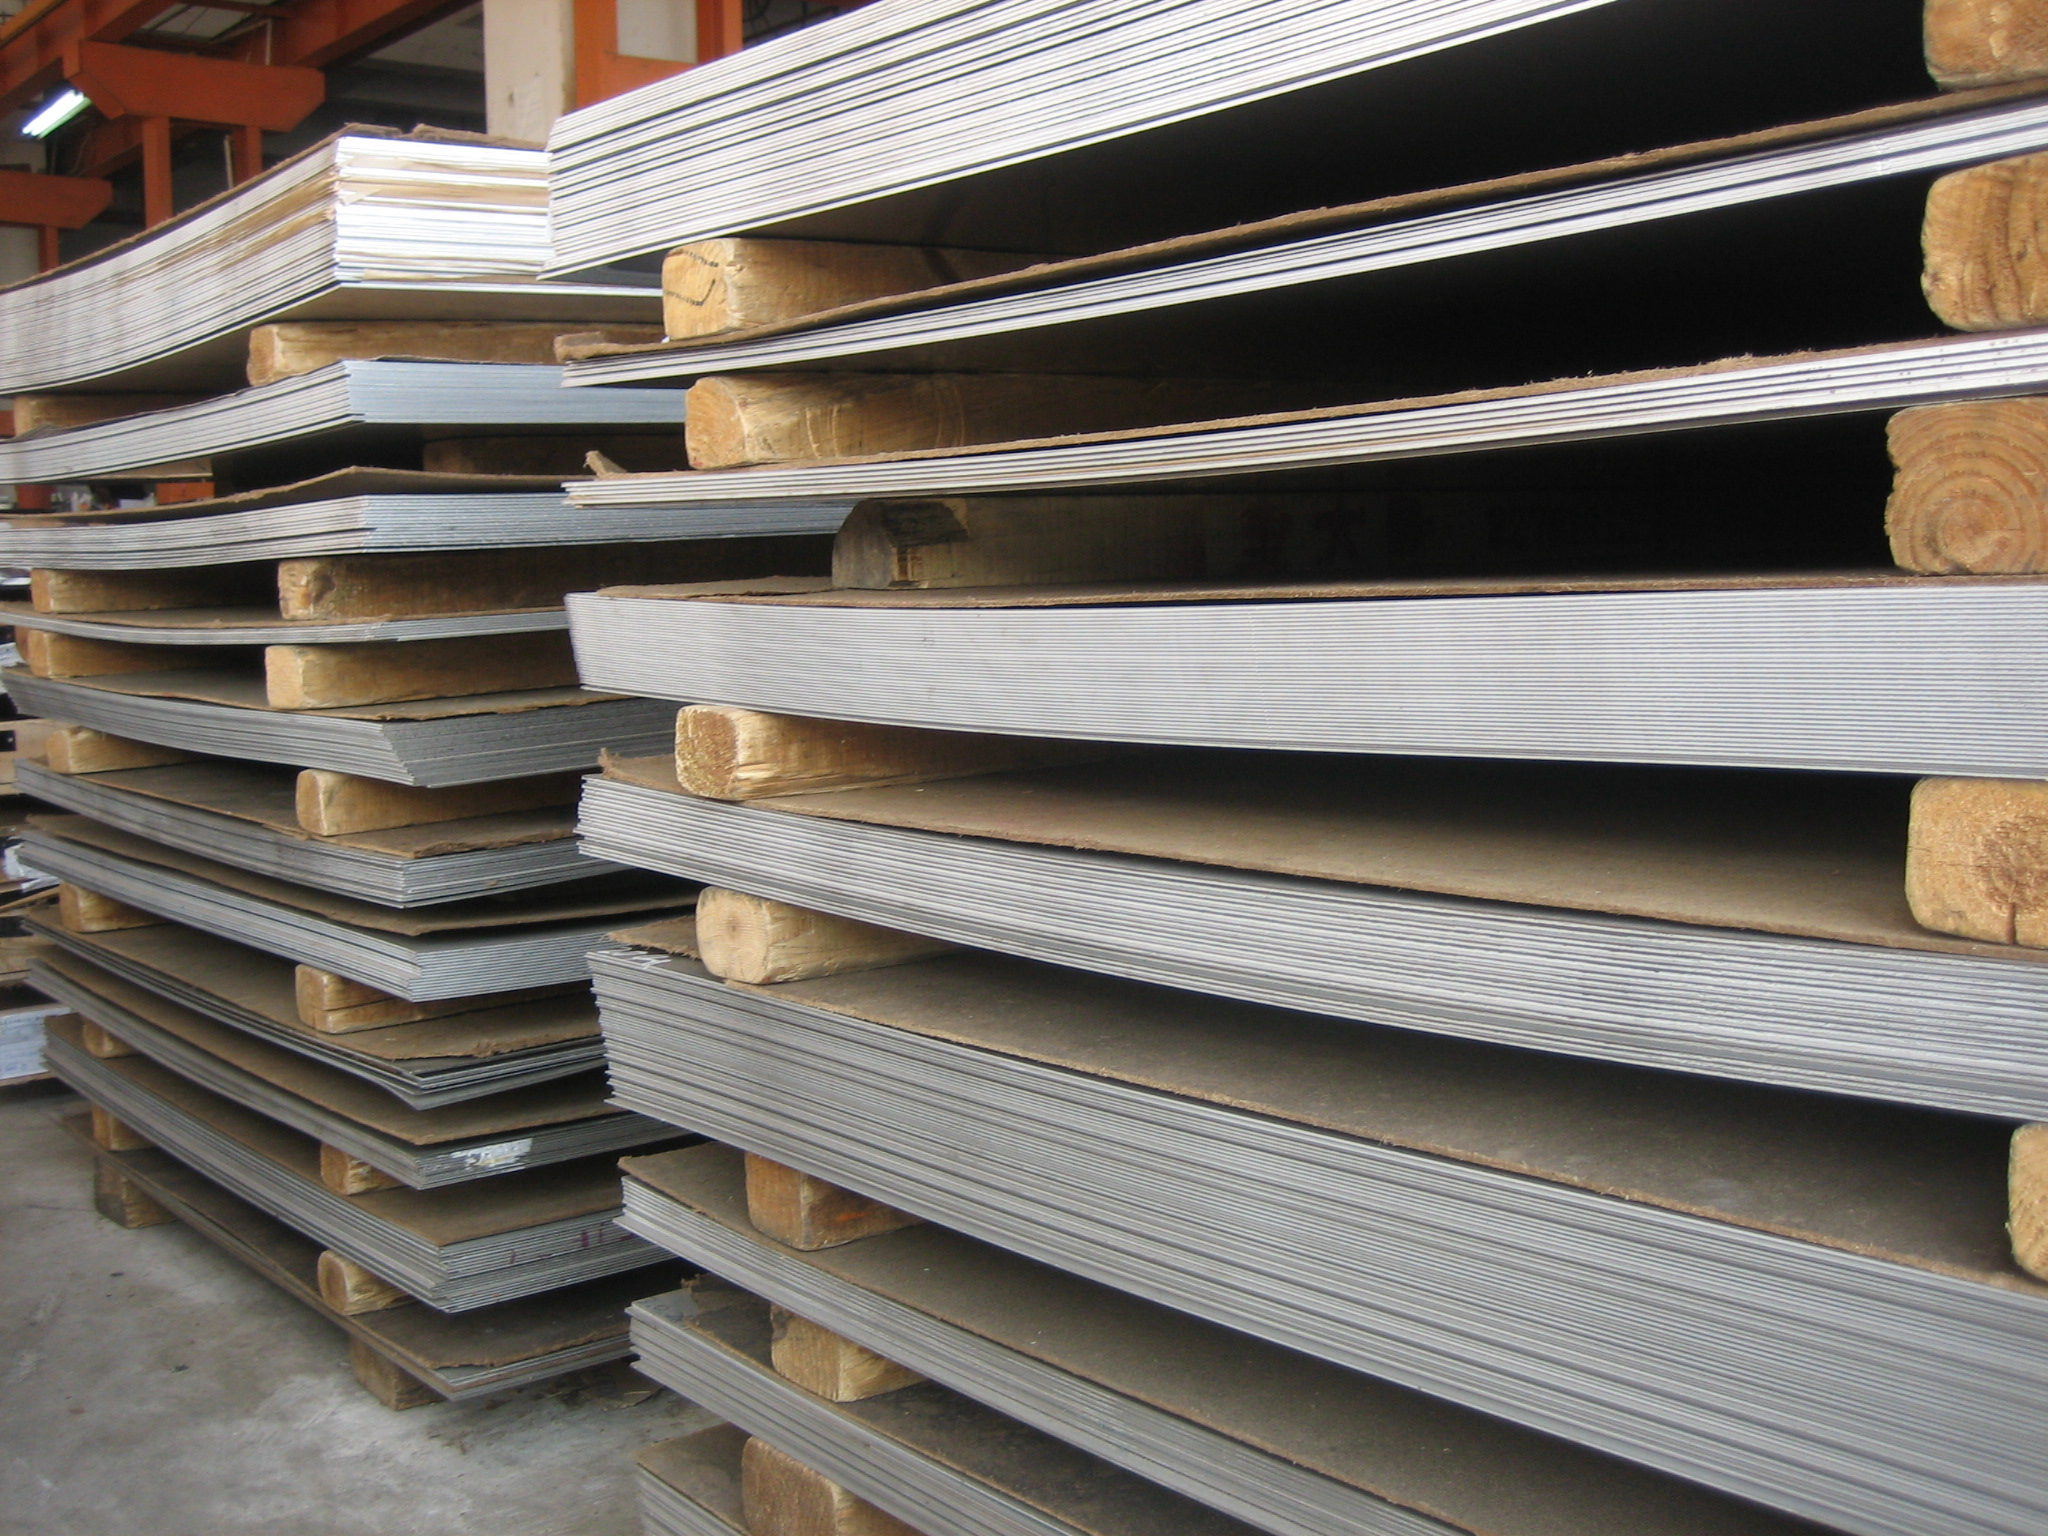 POS439不锈钢 代替304国产不锈钢 进口不锈钢